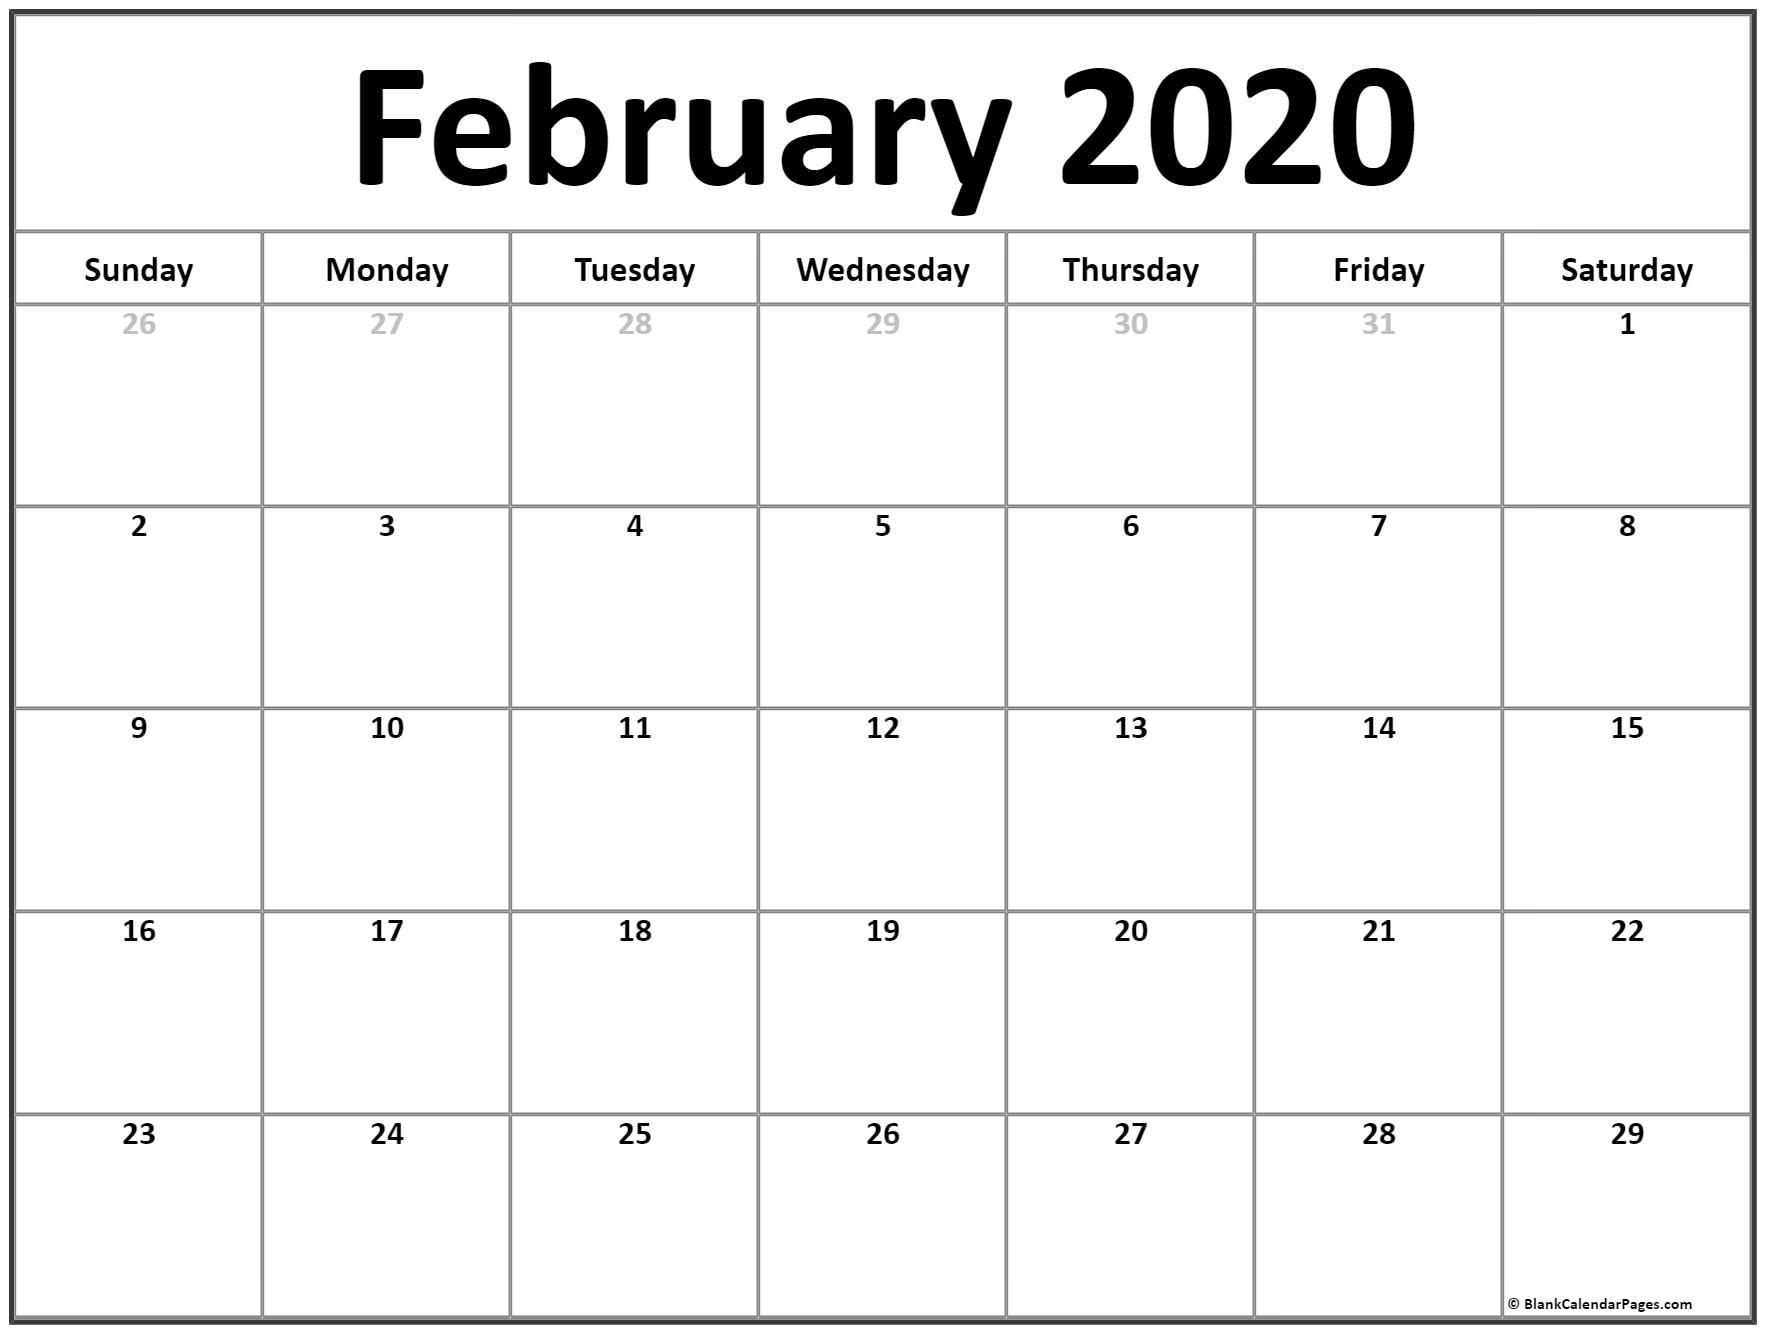 Printable Calendar 2020 by Month February 2020 Calendar